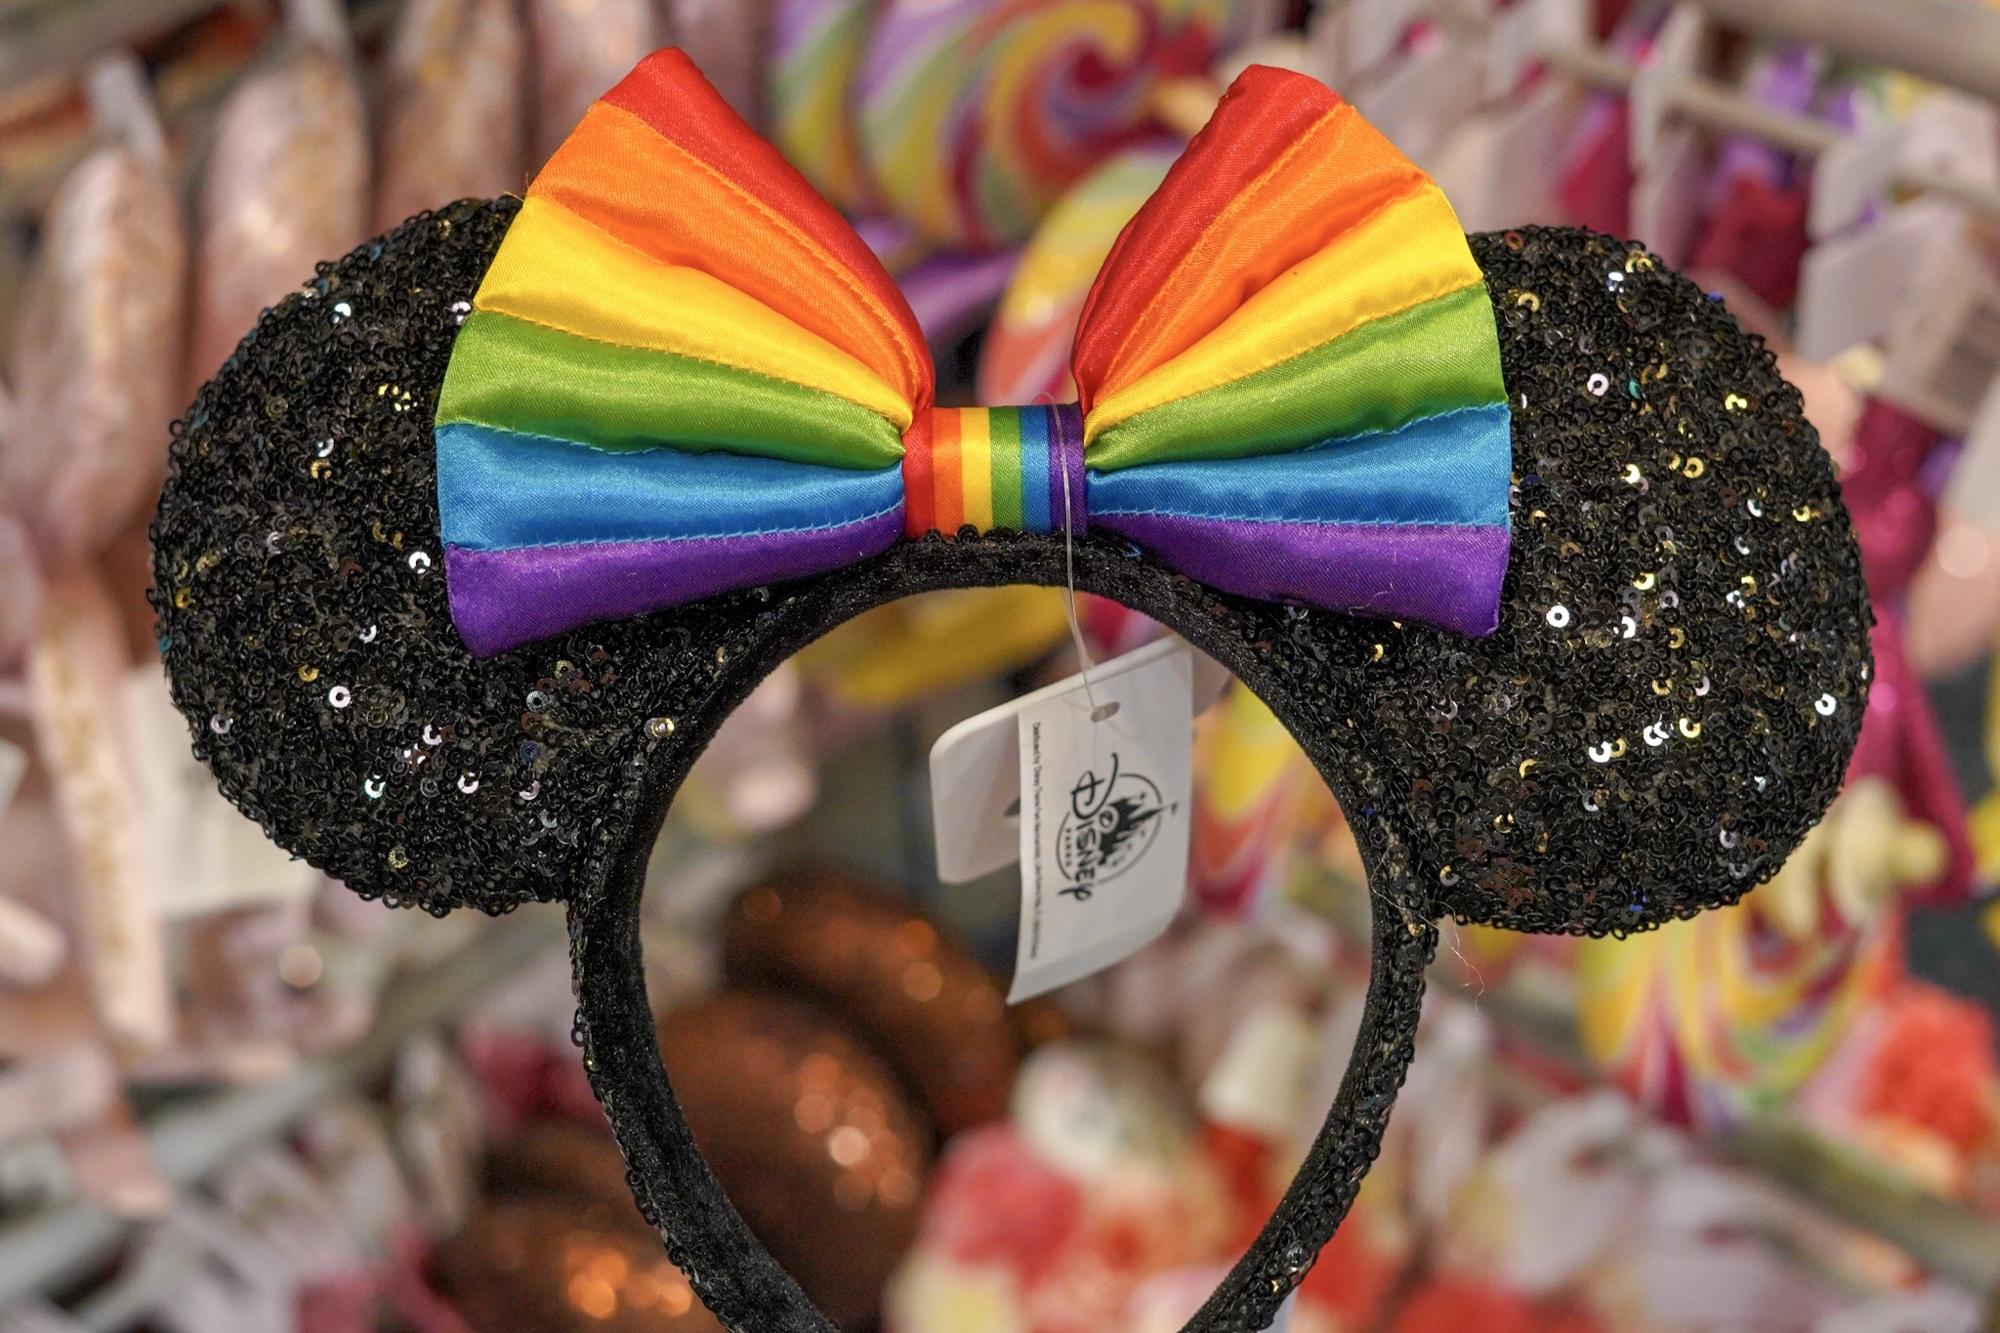 Christmas Minnie Ears 2019.New Pride Ears Arrive At Walt Disney World